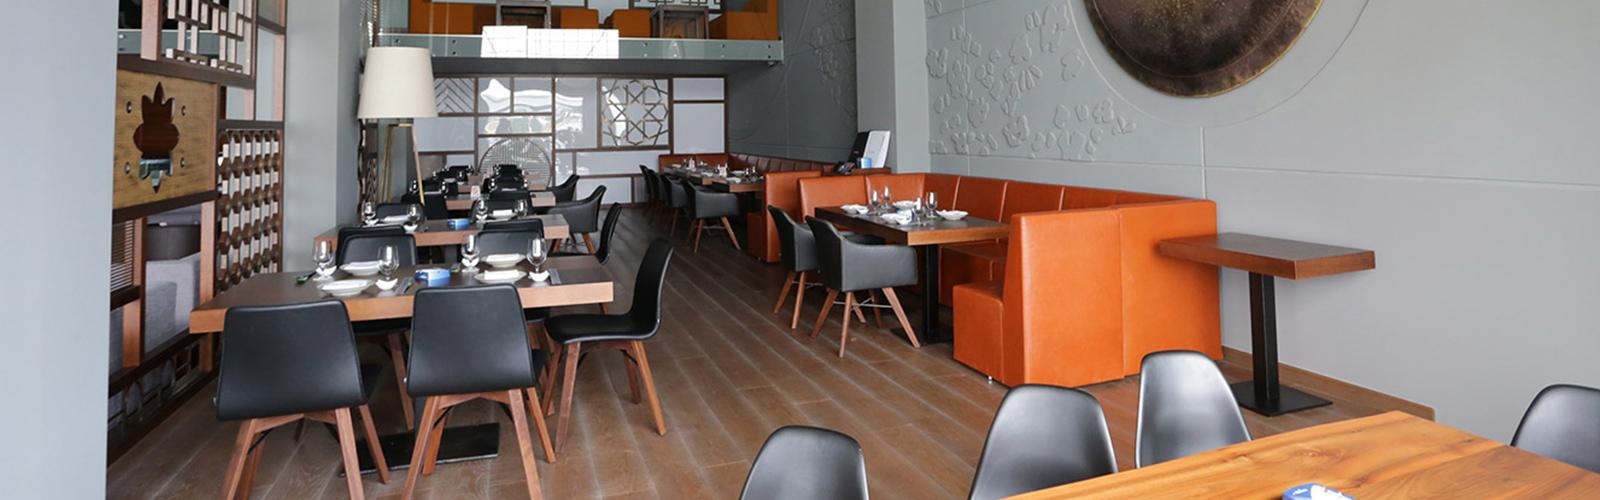 Concierge Belgrade | Restoran Sakura